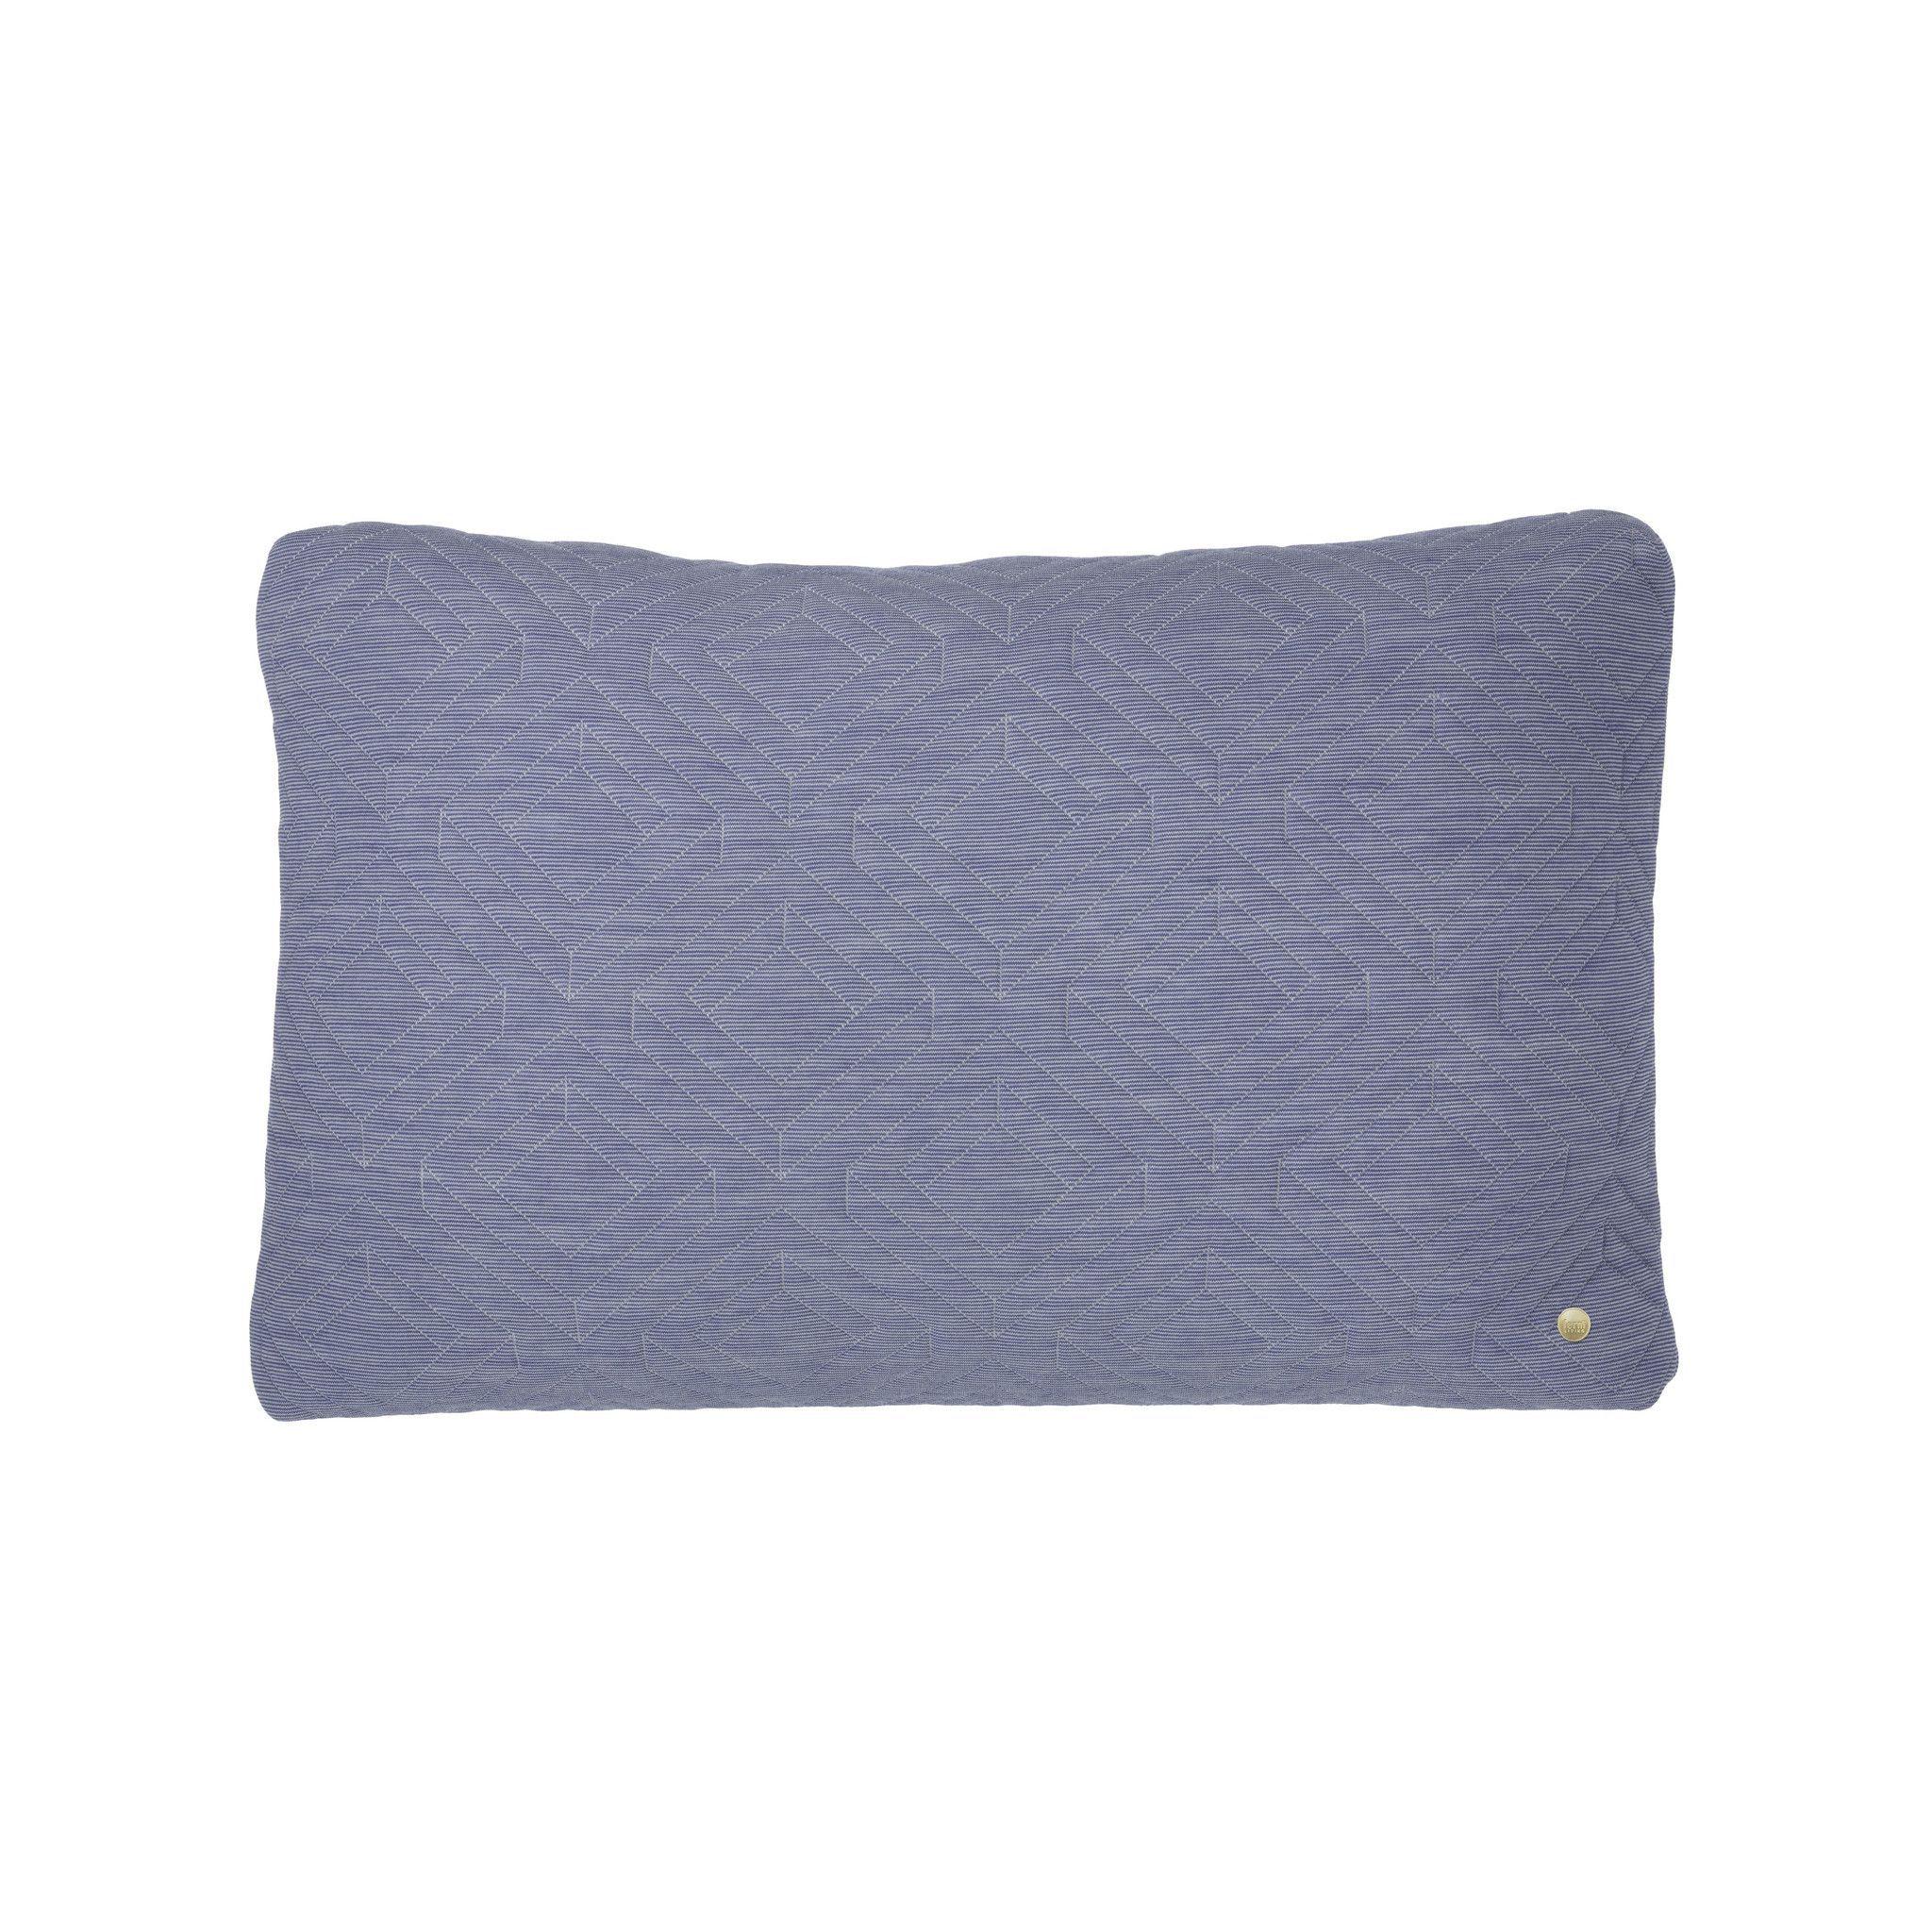 Quilt Cushions with Brass Zipper